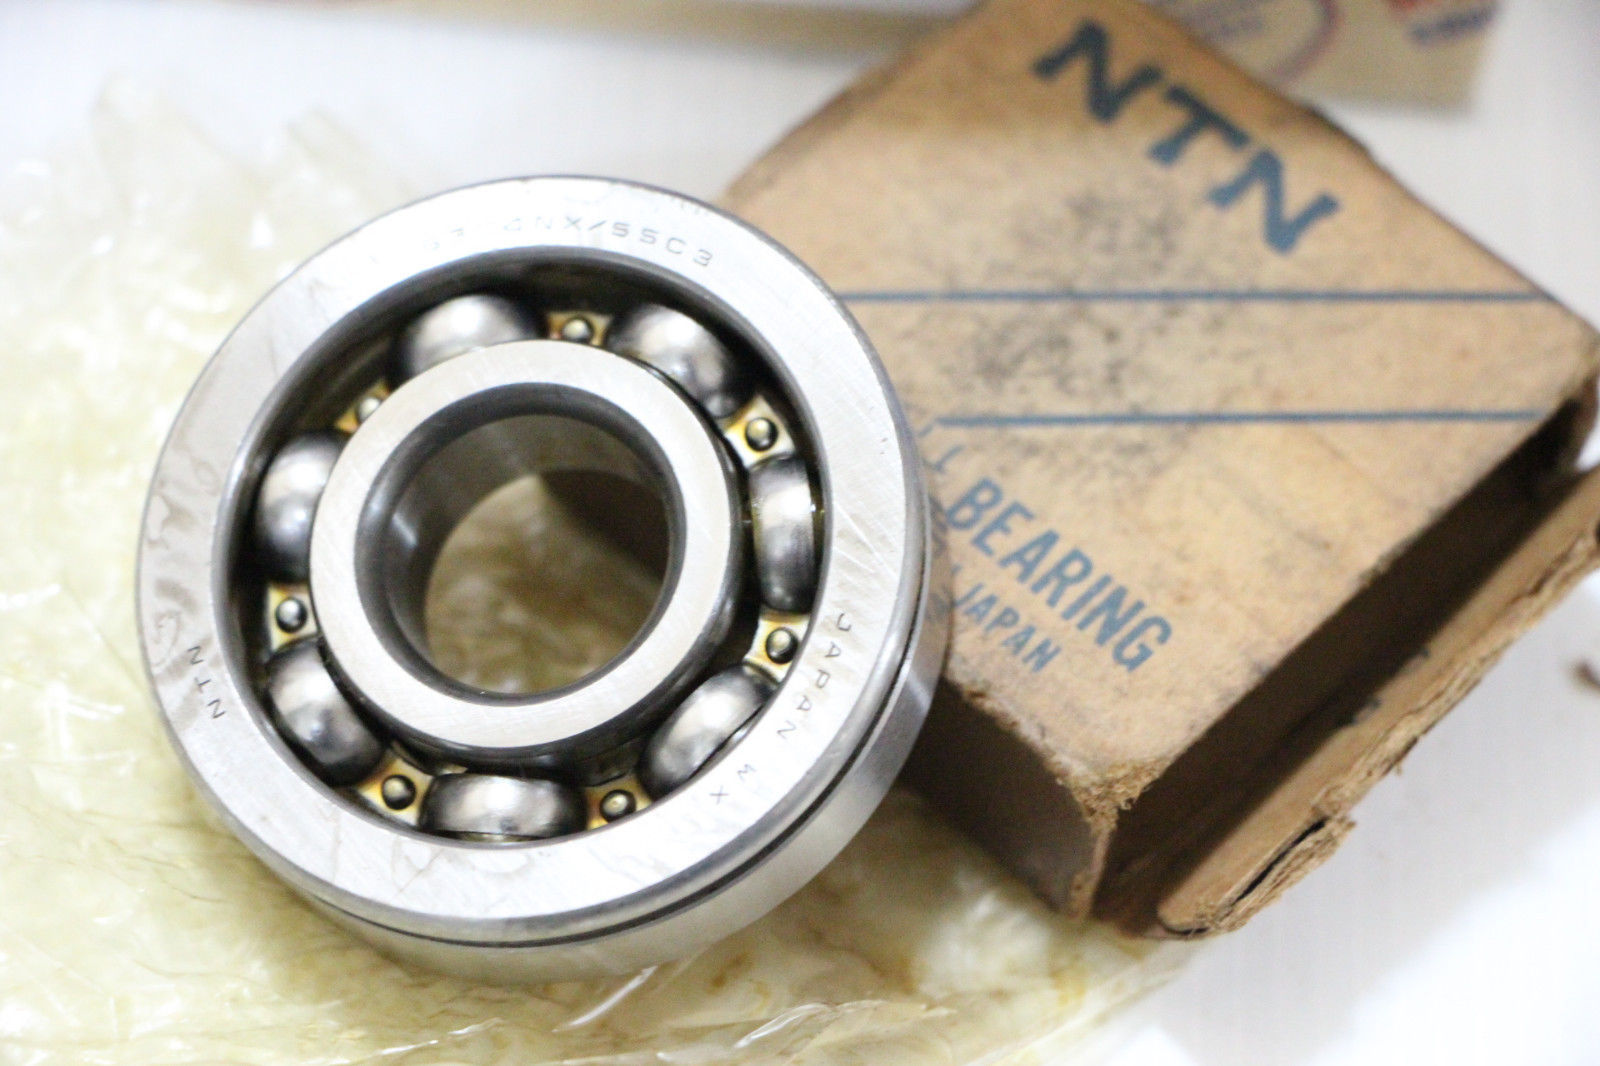 BEARING Ball 6304NX/SSC3 NTN Made in Japan NOS.